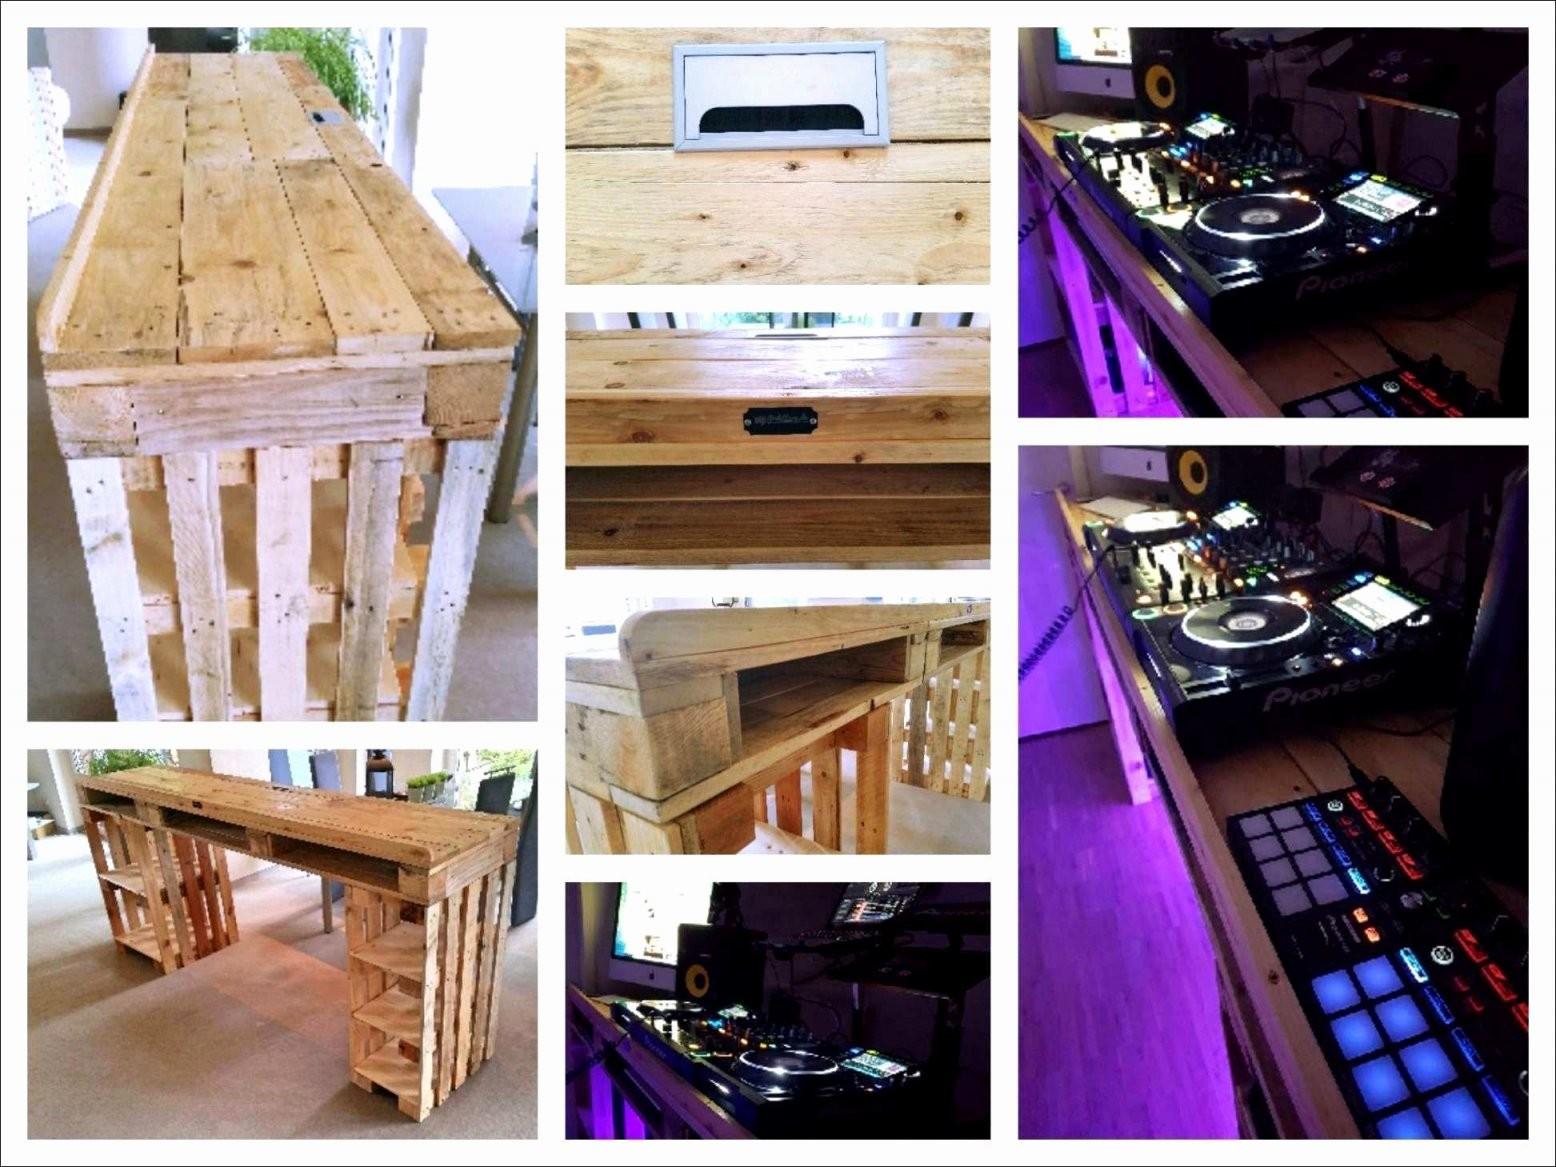 61 Luxus Theke Selber Bauen Holz  Hausplaner Kostenlos Deutsch 3D von Theke Selber Bauen Holz Photo